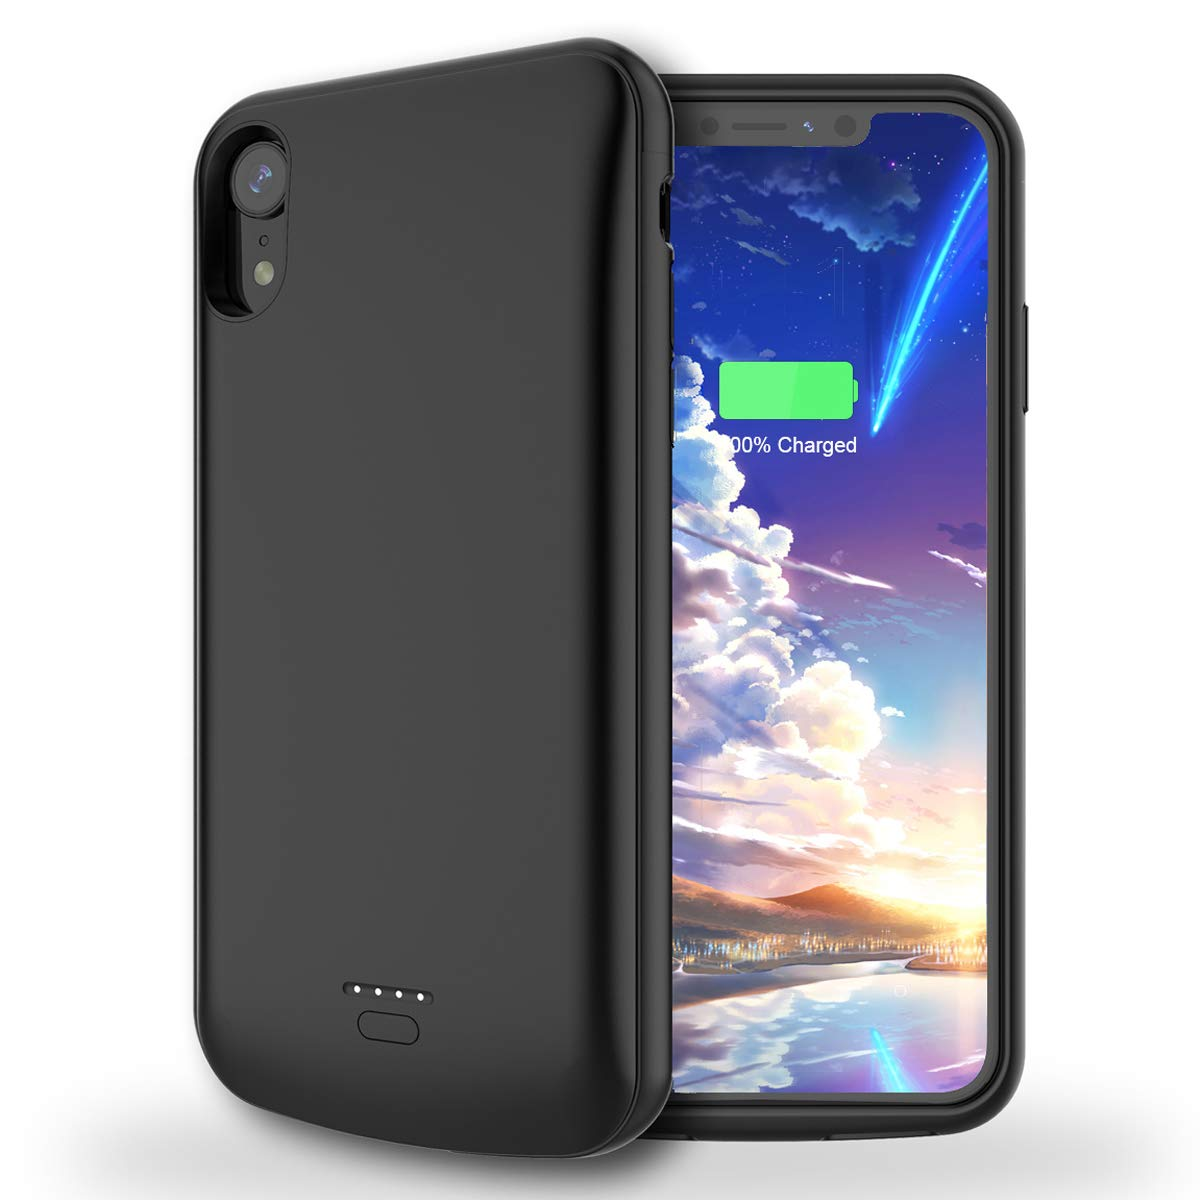 Funda Con Bateria de 5000mah para Apple Iphone Xr LCLEBM [7F6T3SLB]